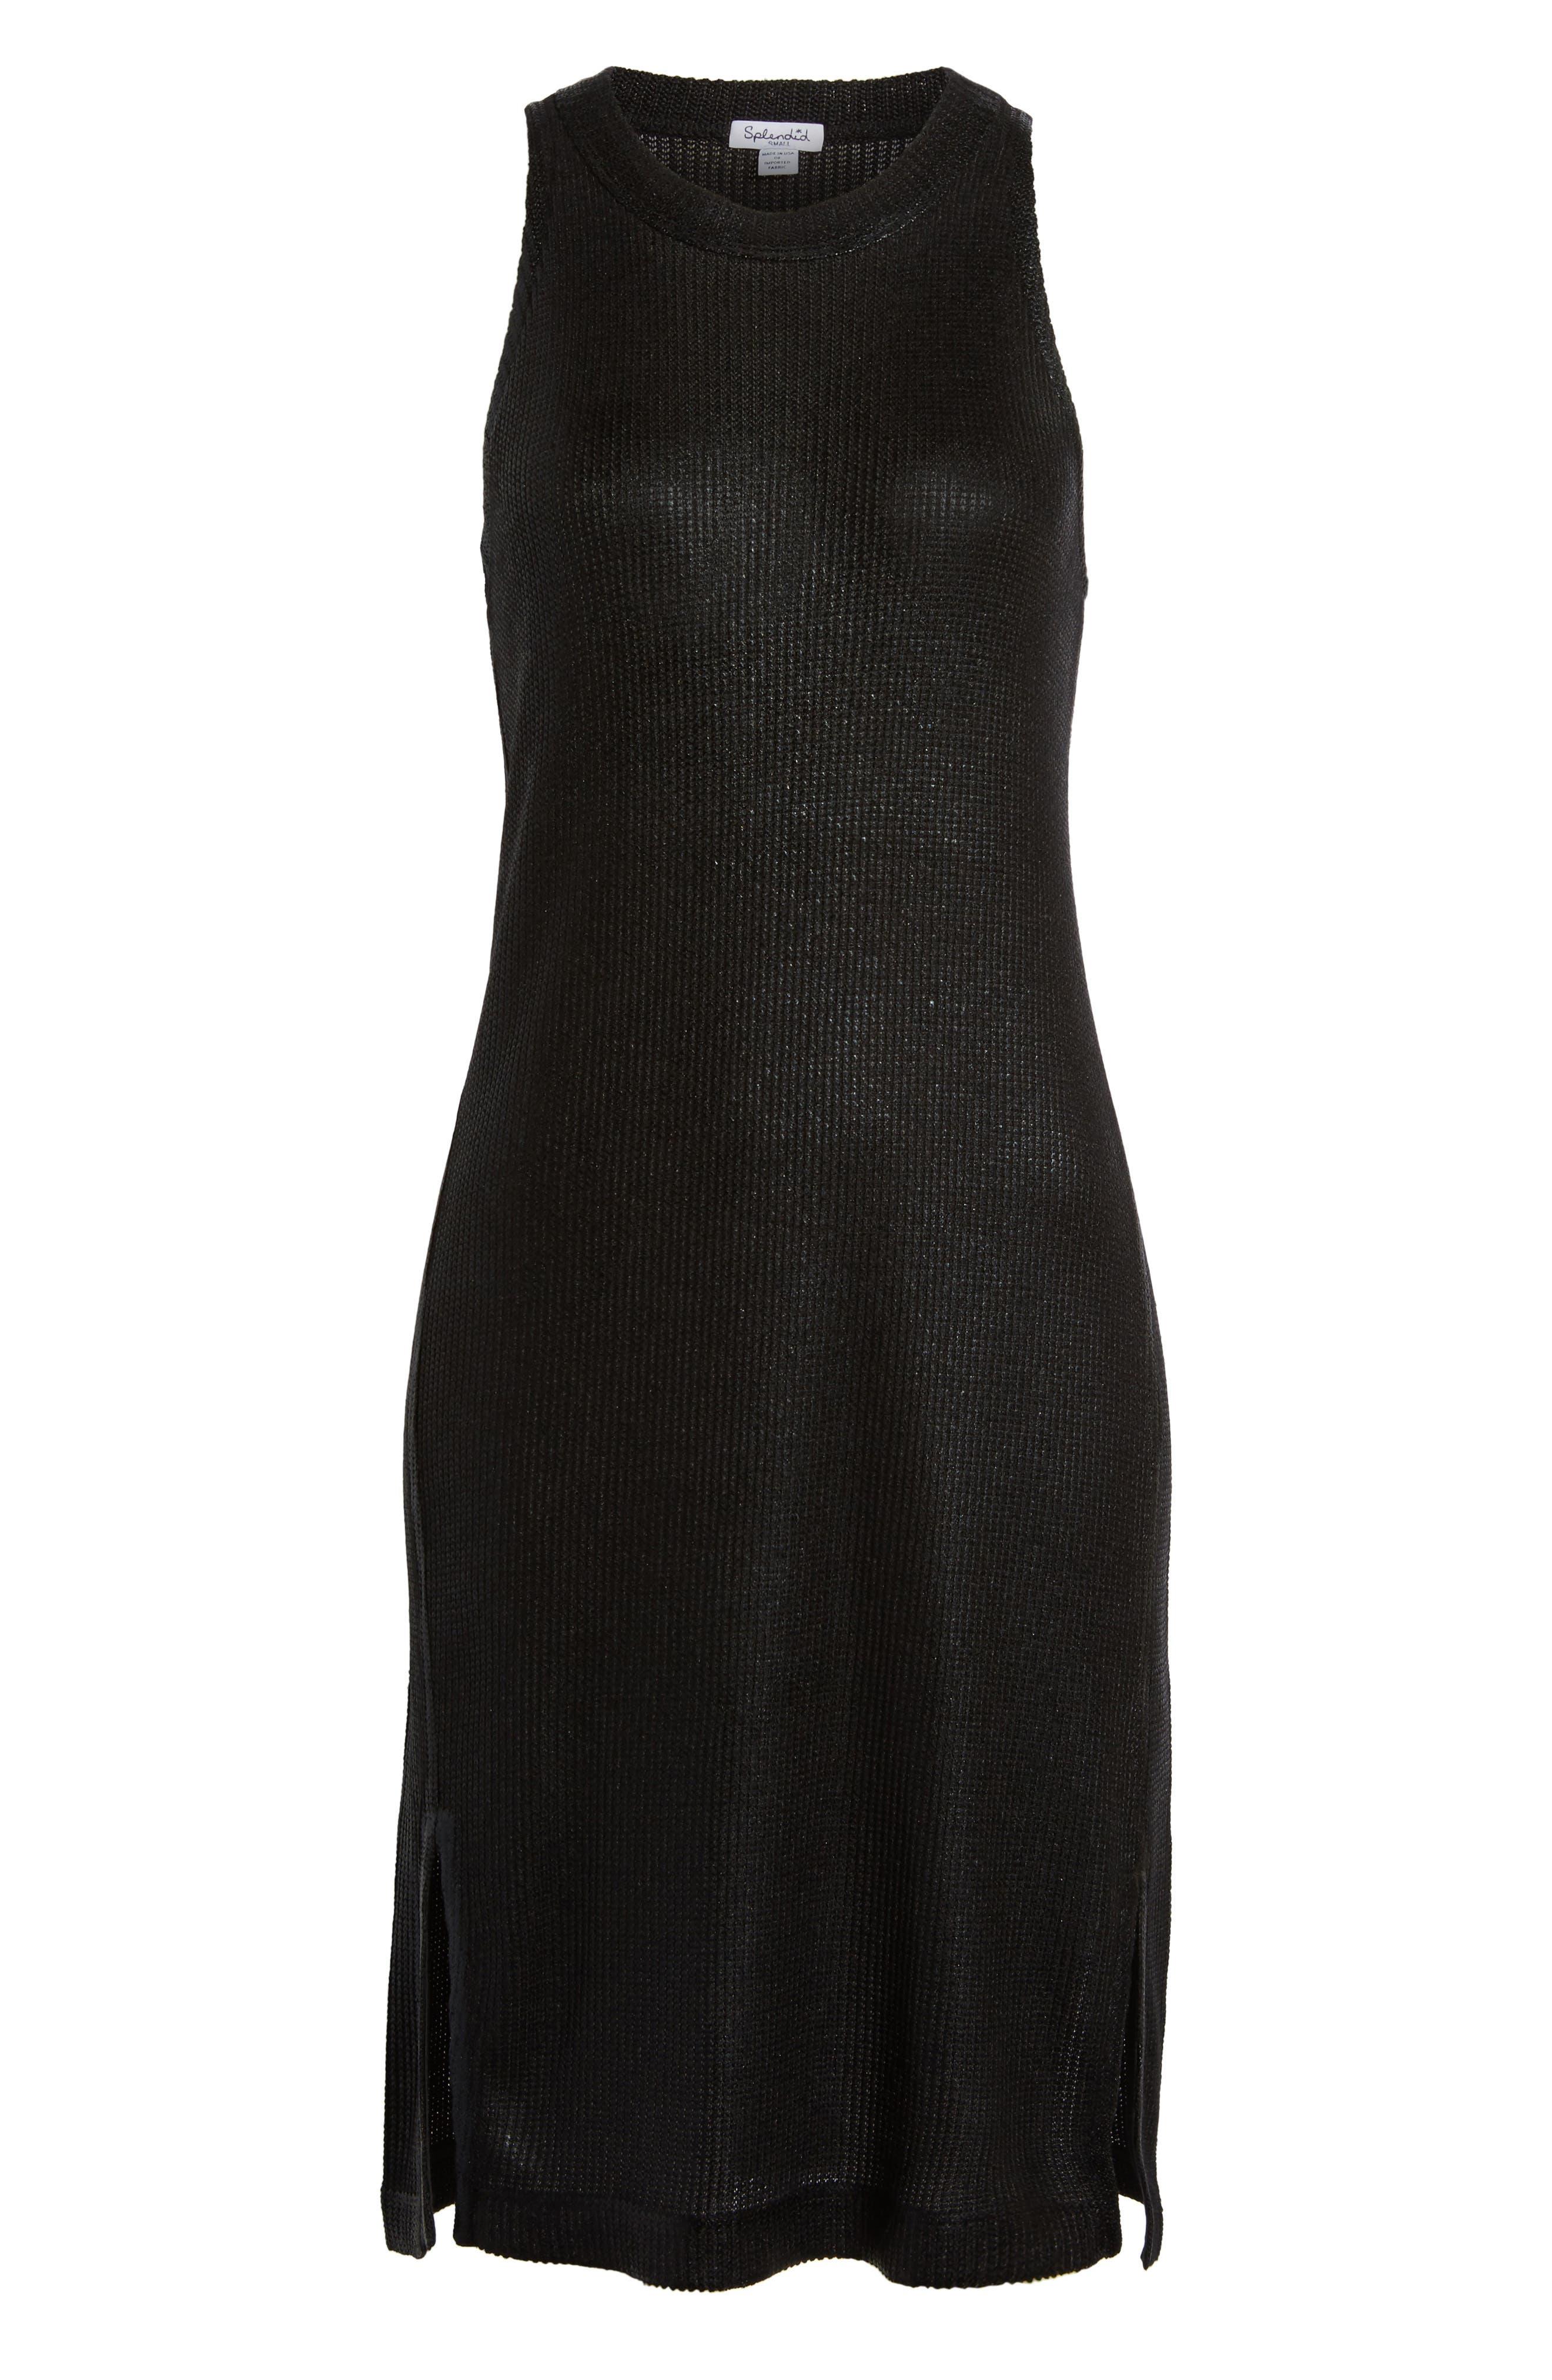 Metallic Coated Dress,                             Alternate thumbnail 6, color,                             Black